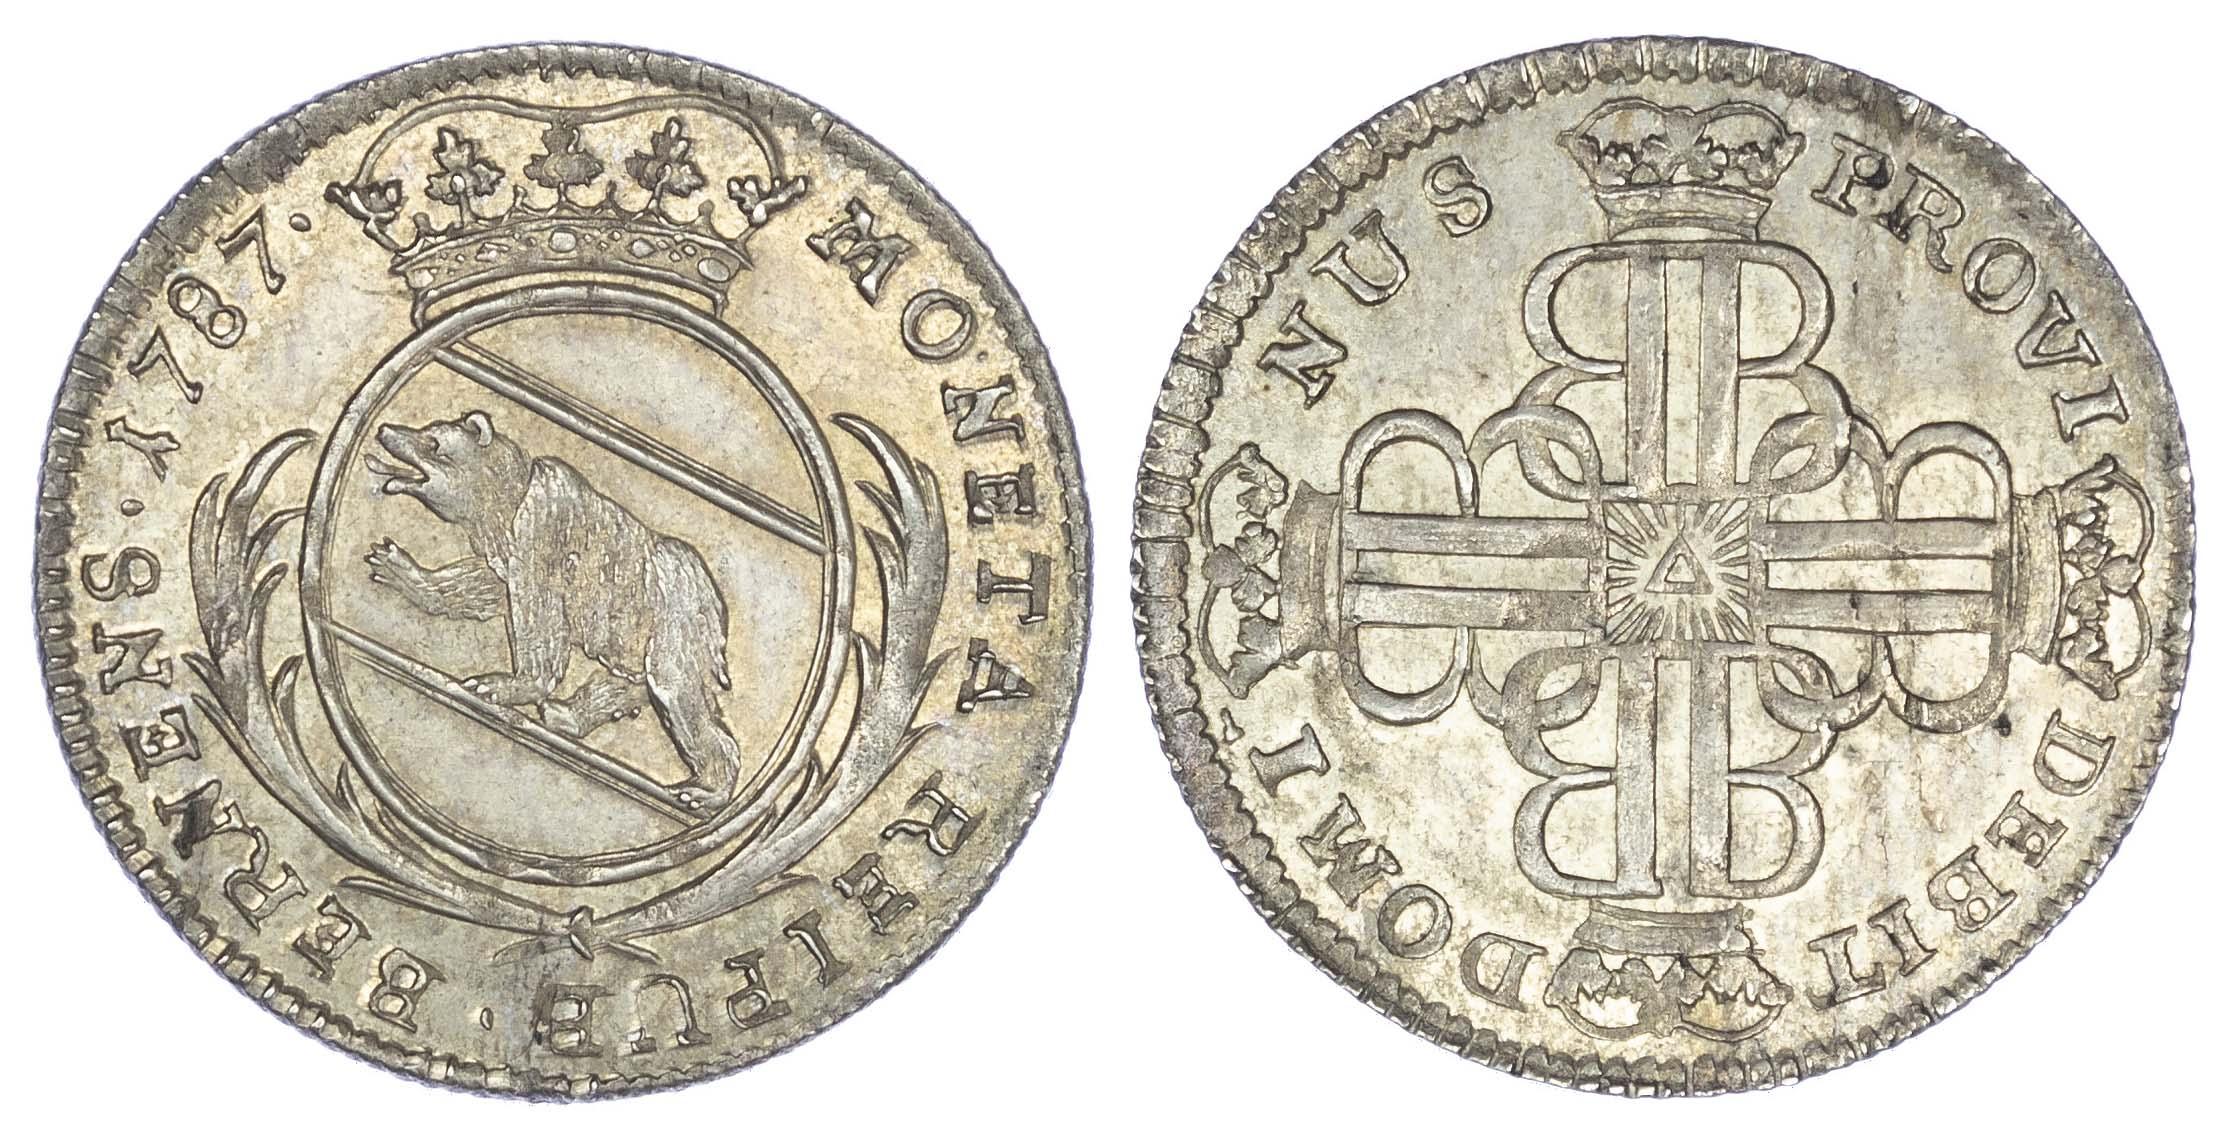 Switzerland, Bern, silver 20 Kreuzer, 1787